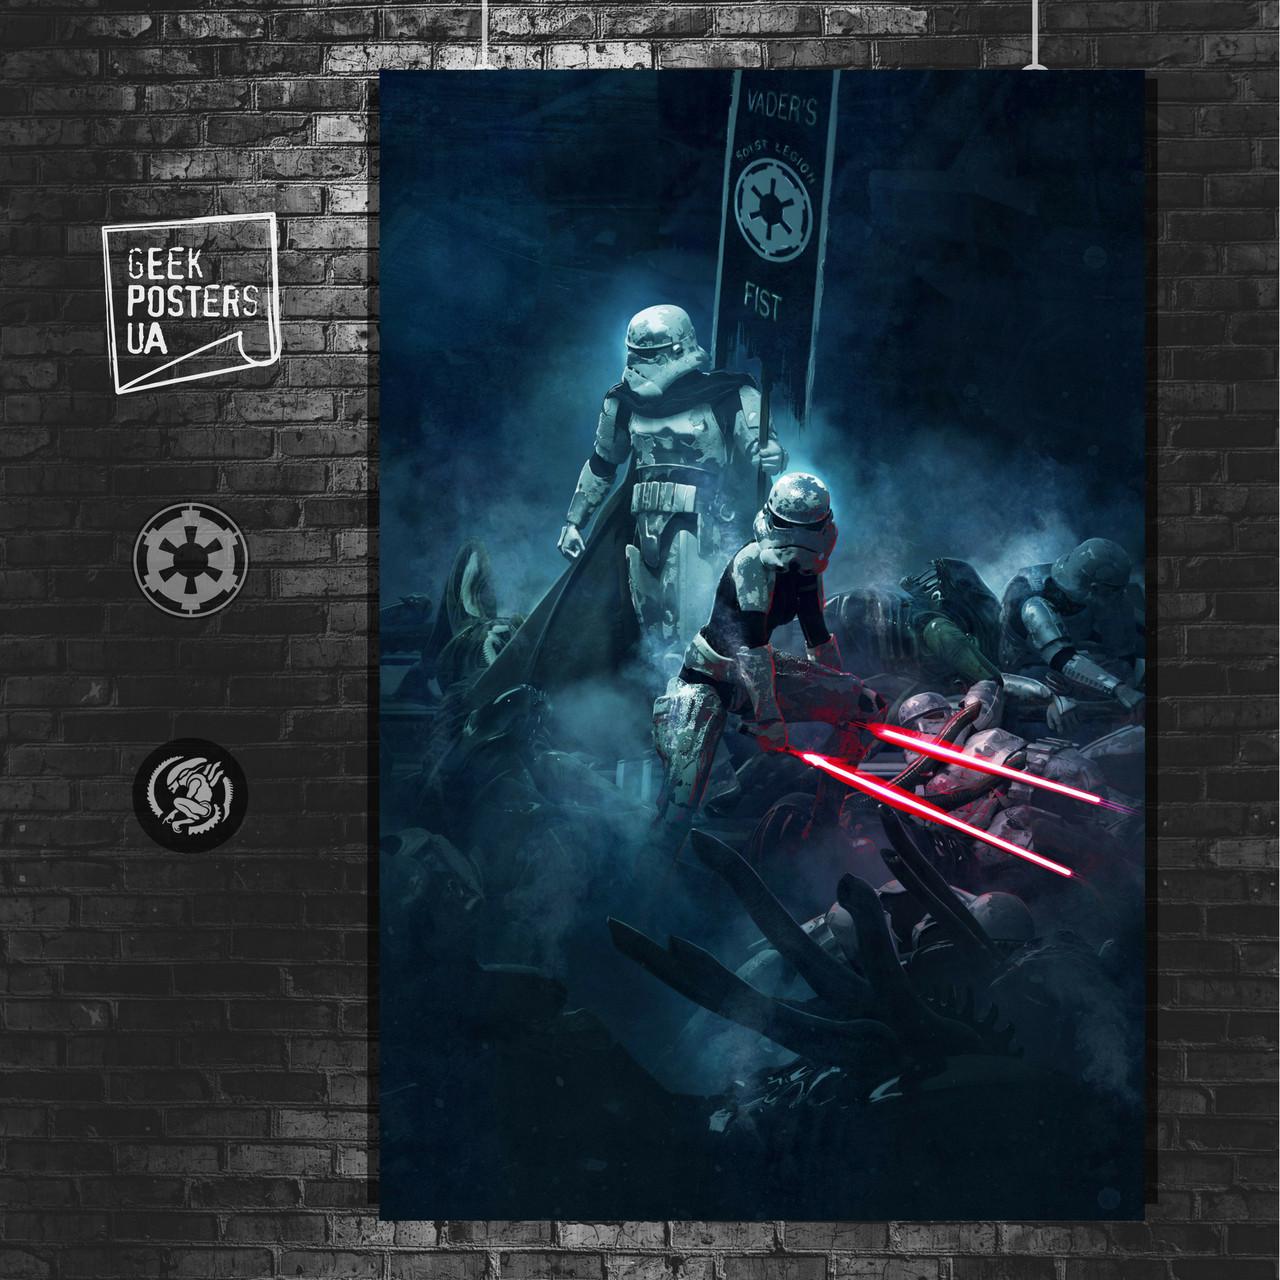 Постер Vader's Fist, штурмовик с мечами. Размер 60x42см (A2). Глянцевая бумага